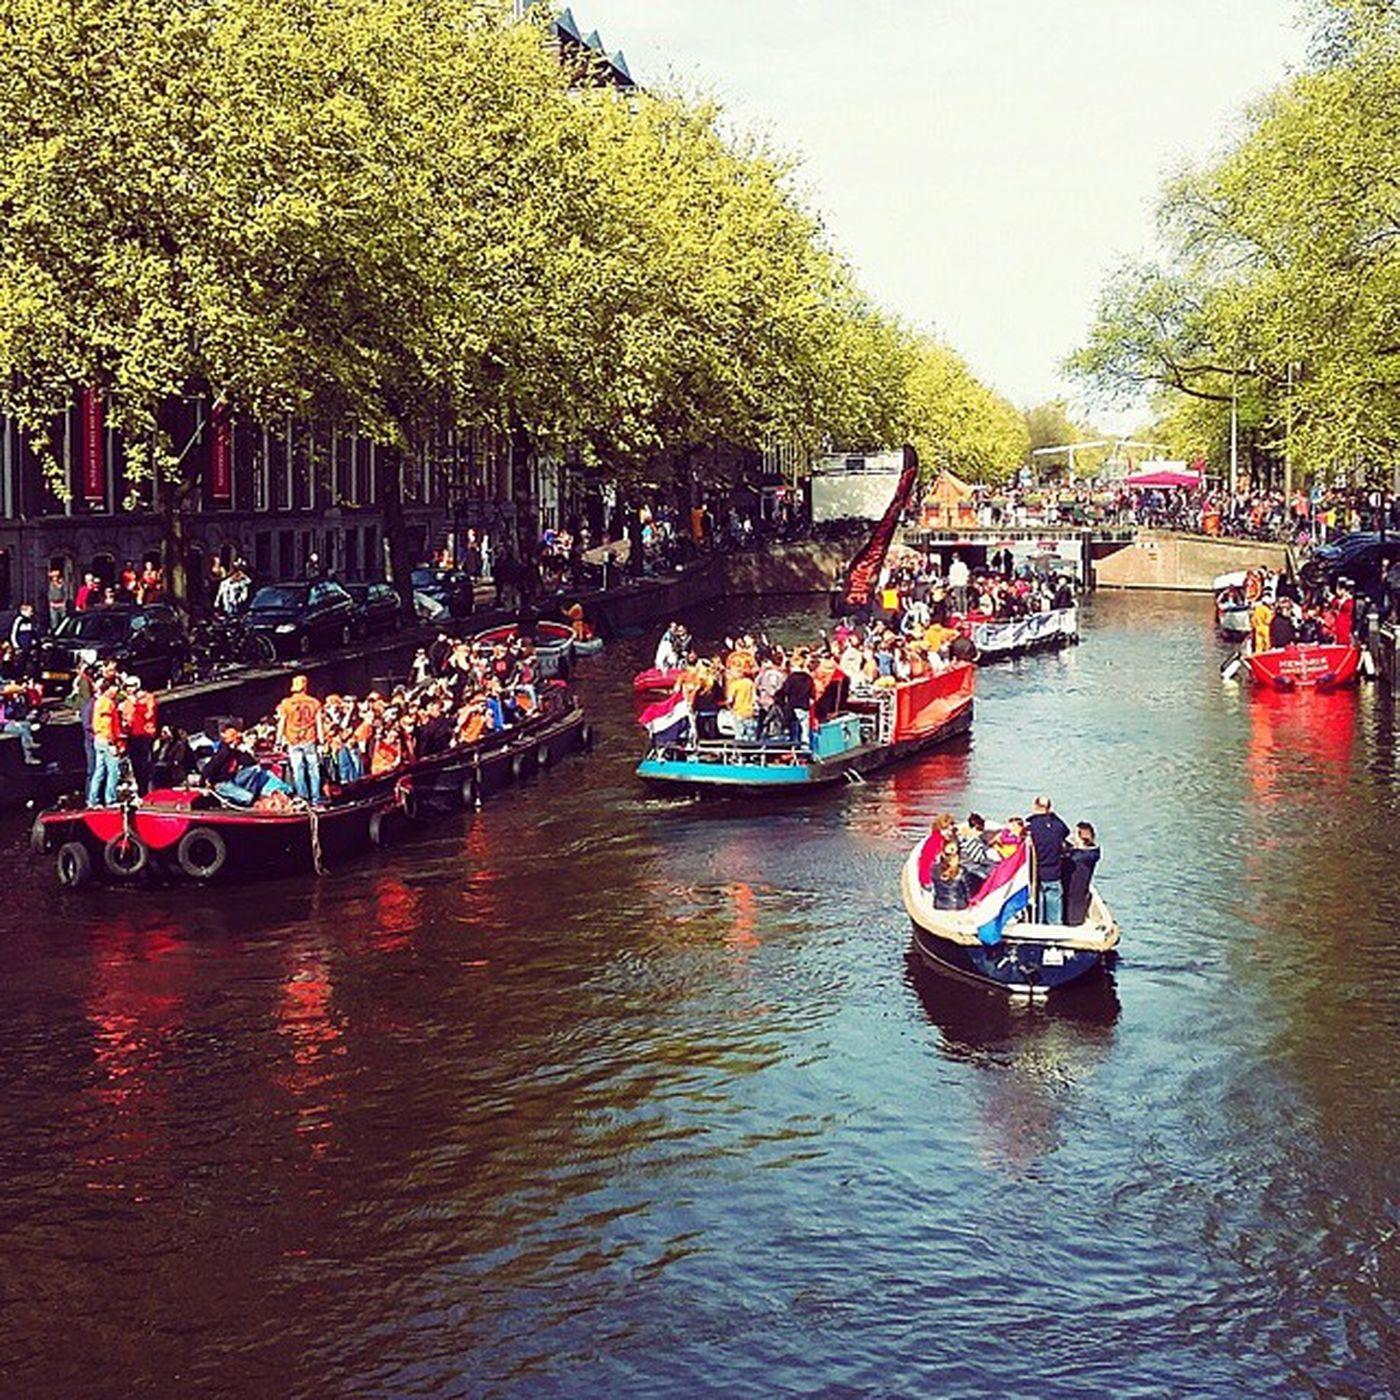 Koningsdag Koningsdag2015 Kingsday Amsterdam netherland travelphotography traveling instatravel instadaily colorful orange holland fun music dance photooftheday